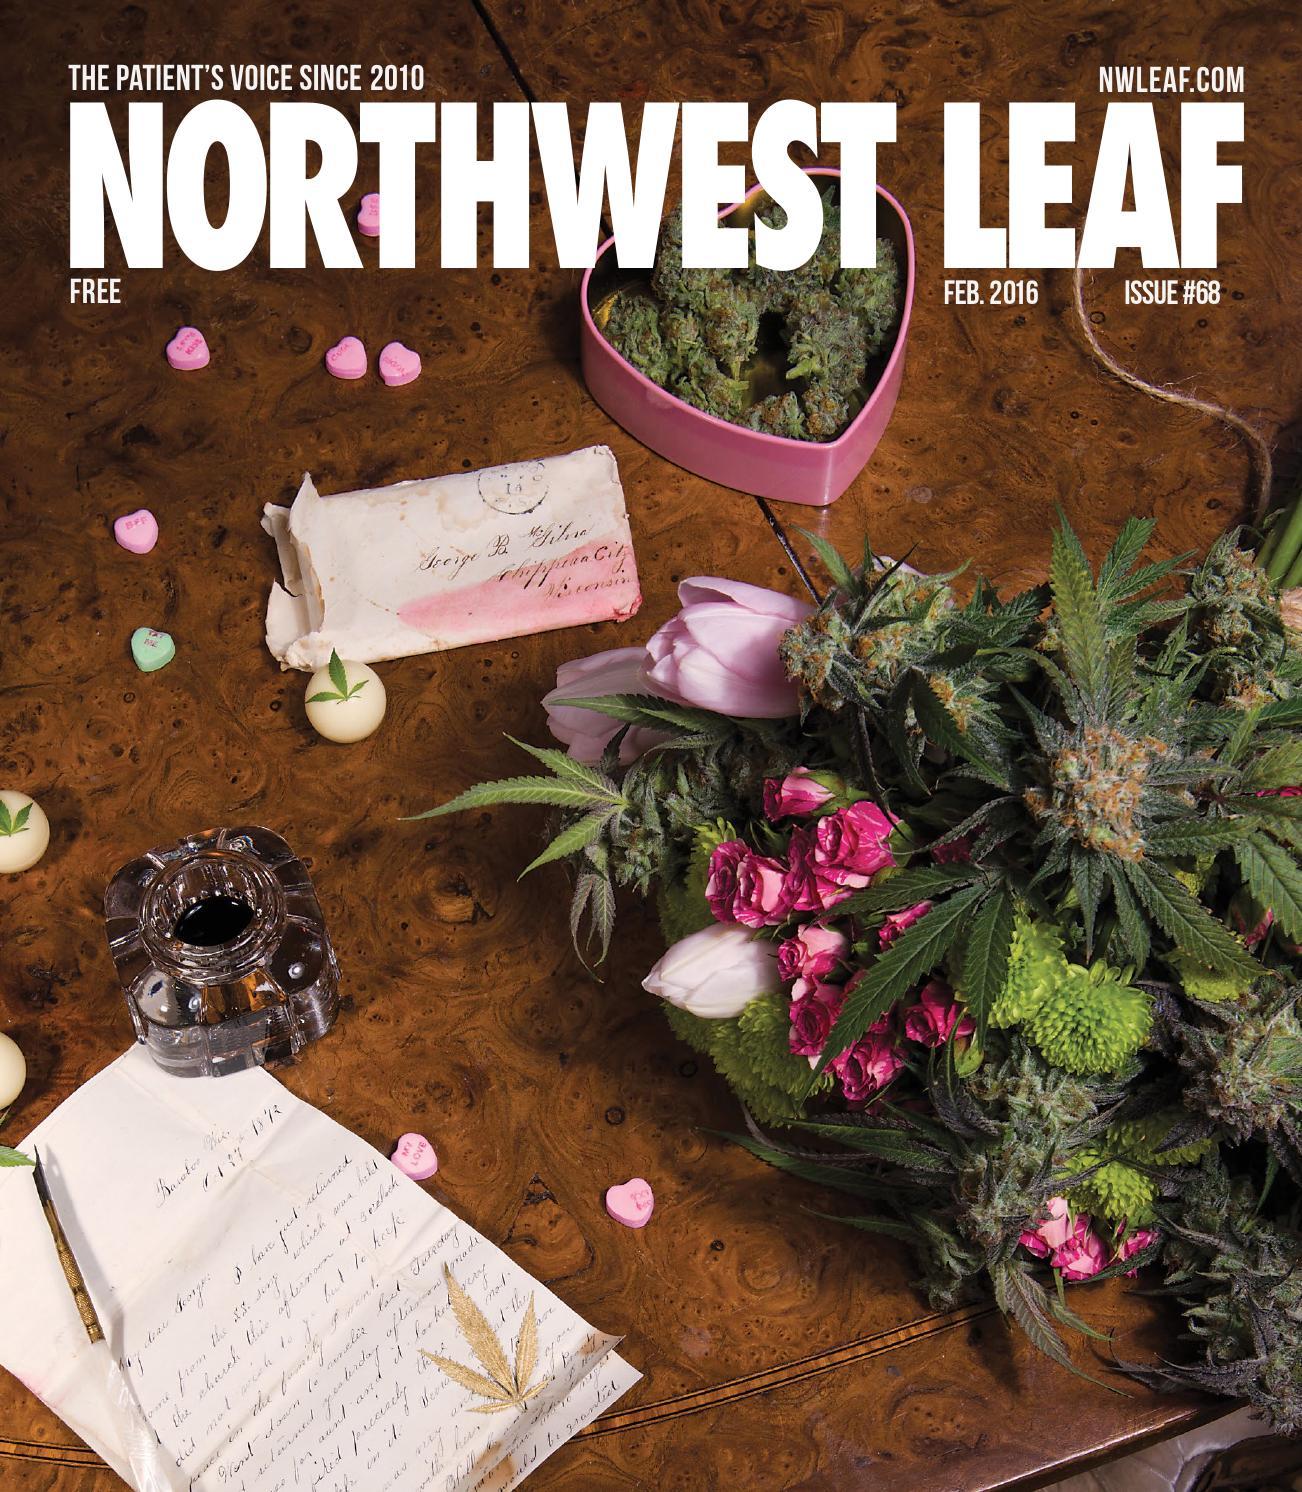 Feb 2016 issue 68 by northwest leaf oregon leaf alaska leaf feb 2016 issue 68 by northwest leaf oregon leaf alaska leaf issuu nvjuhfo Image collections